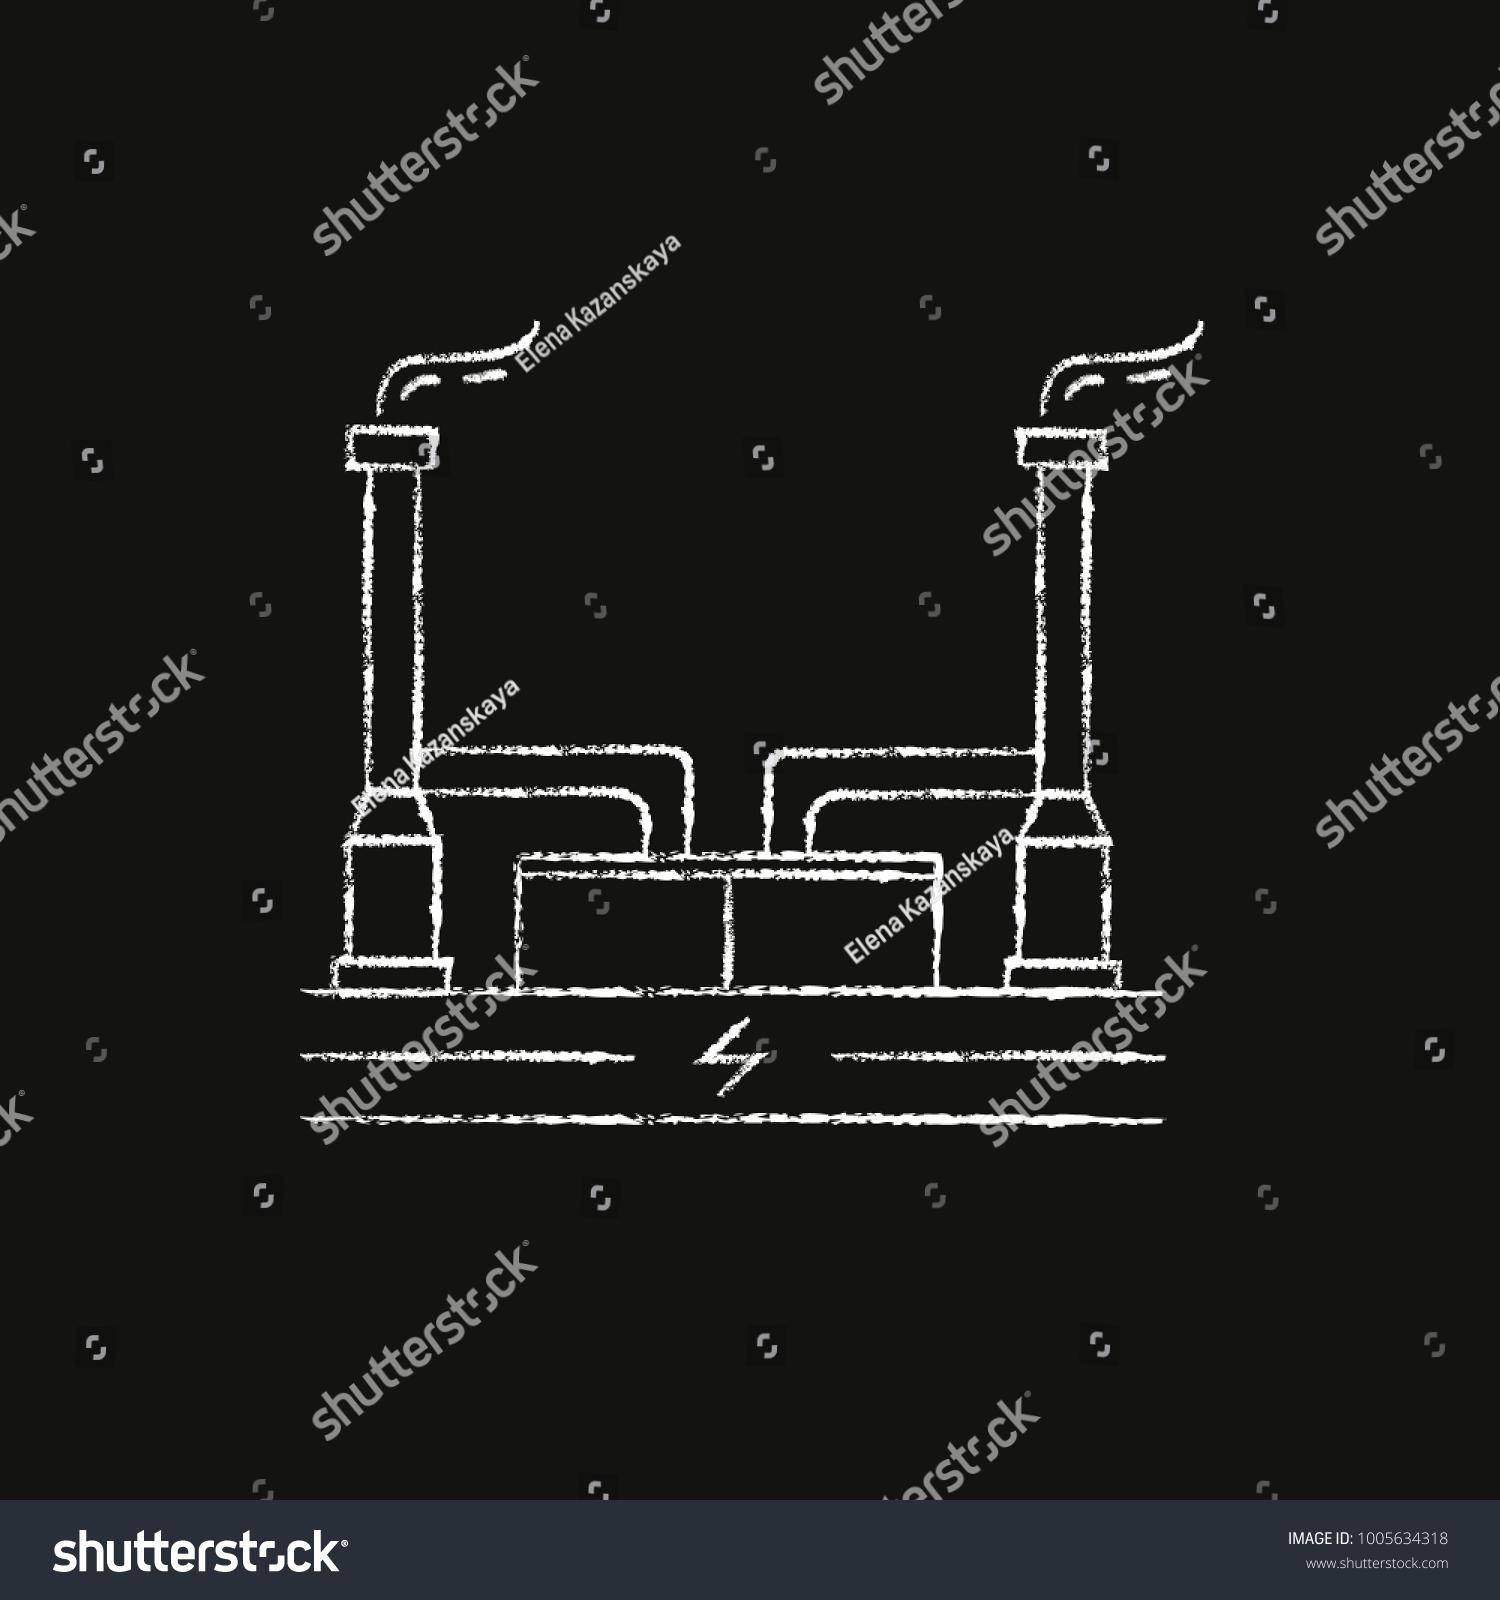 Outline Geothermal Power Plant Icon Sketch Stock Illustration Schematic Diagram On Chalkboard Alternative Renewable Energy Concept Symbol Chalk